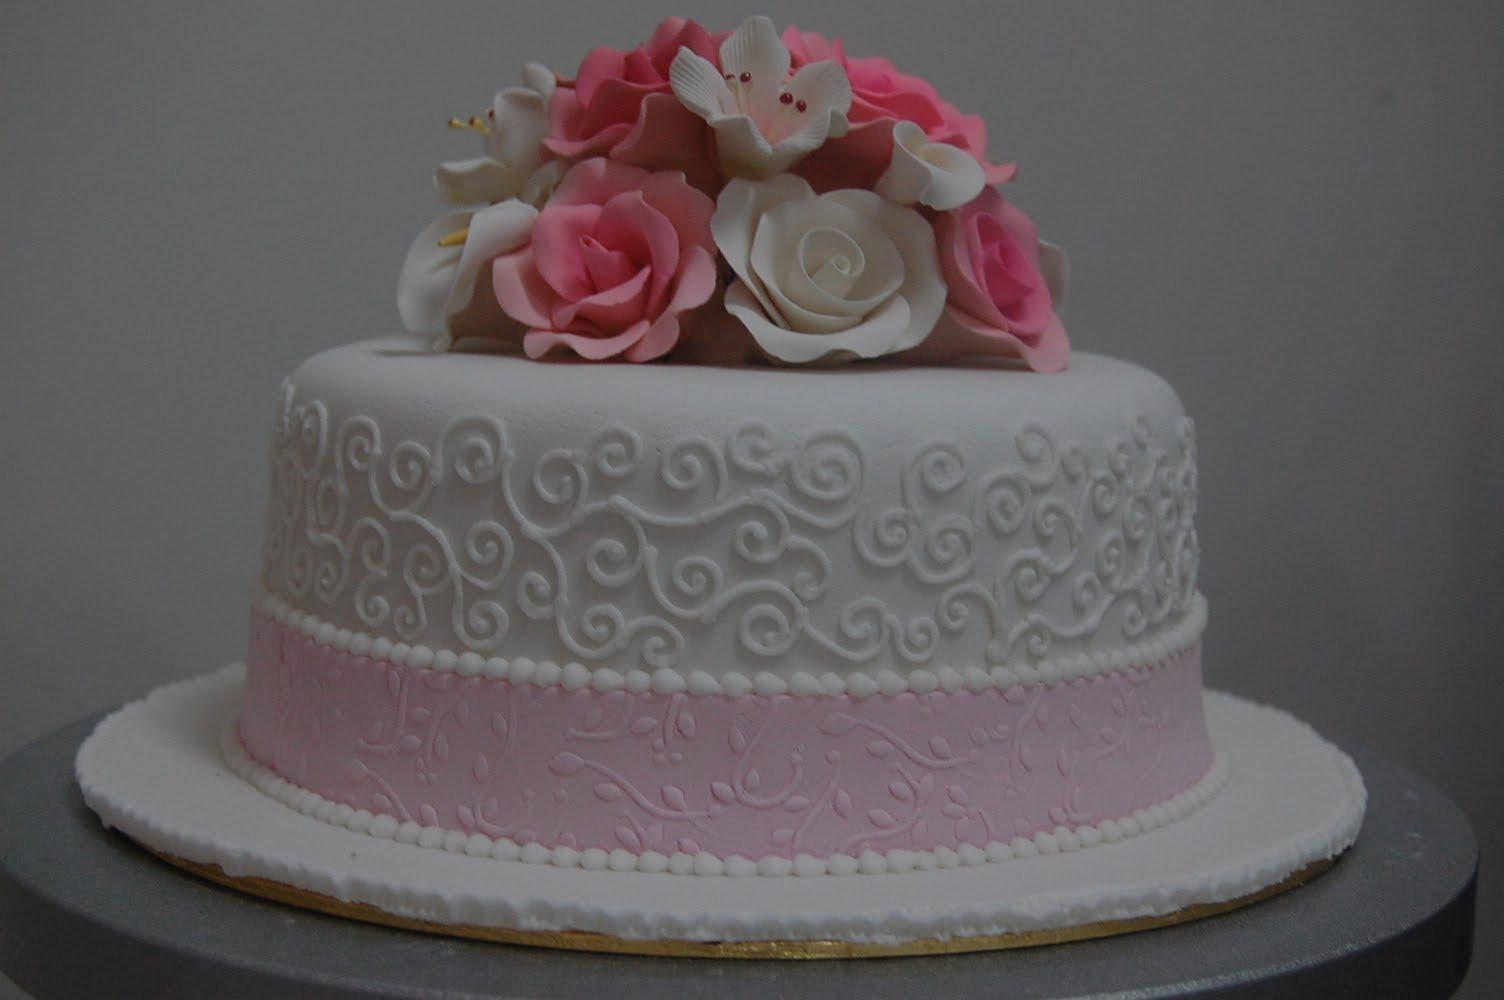 Cake Images With Name Rani : Pin Pin Rani Canglun Delights Fondant Barbie Doll Cake On ...